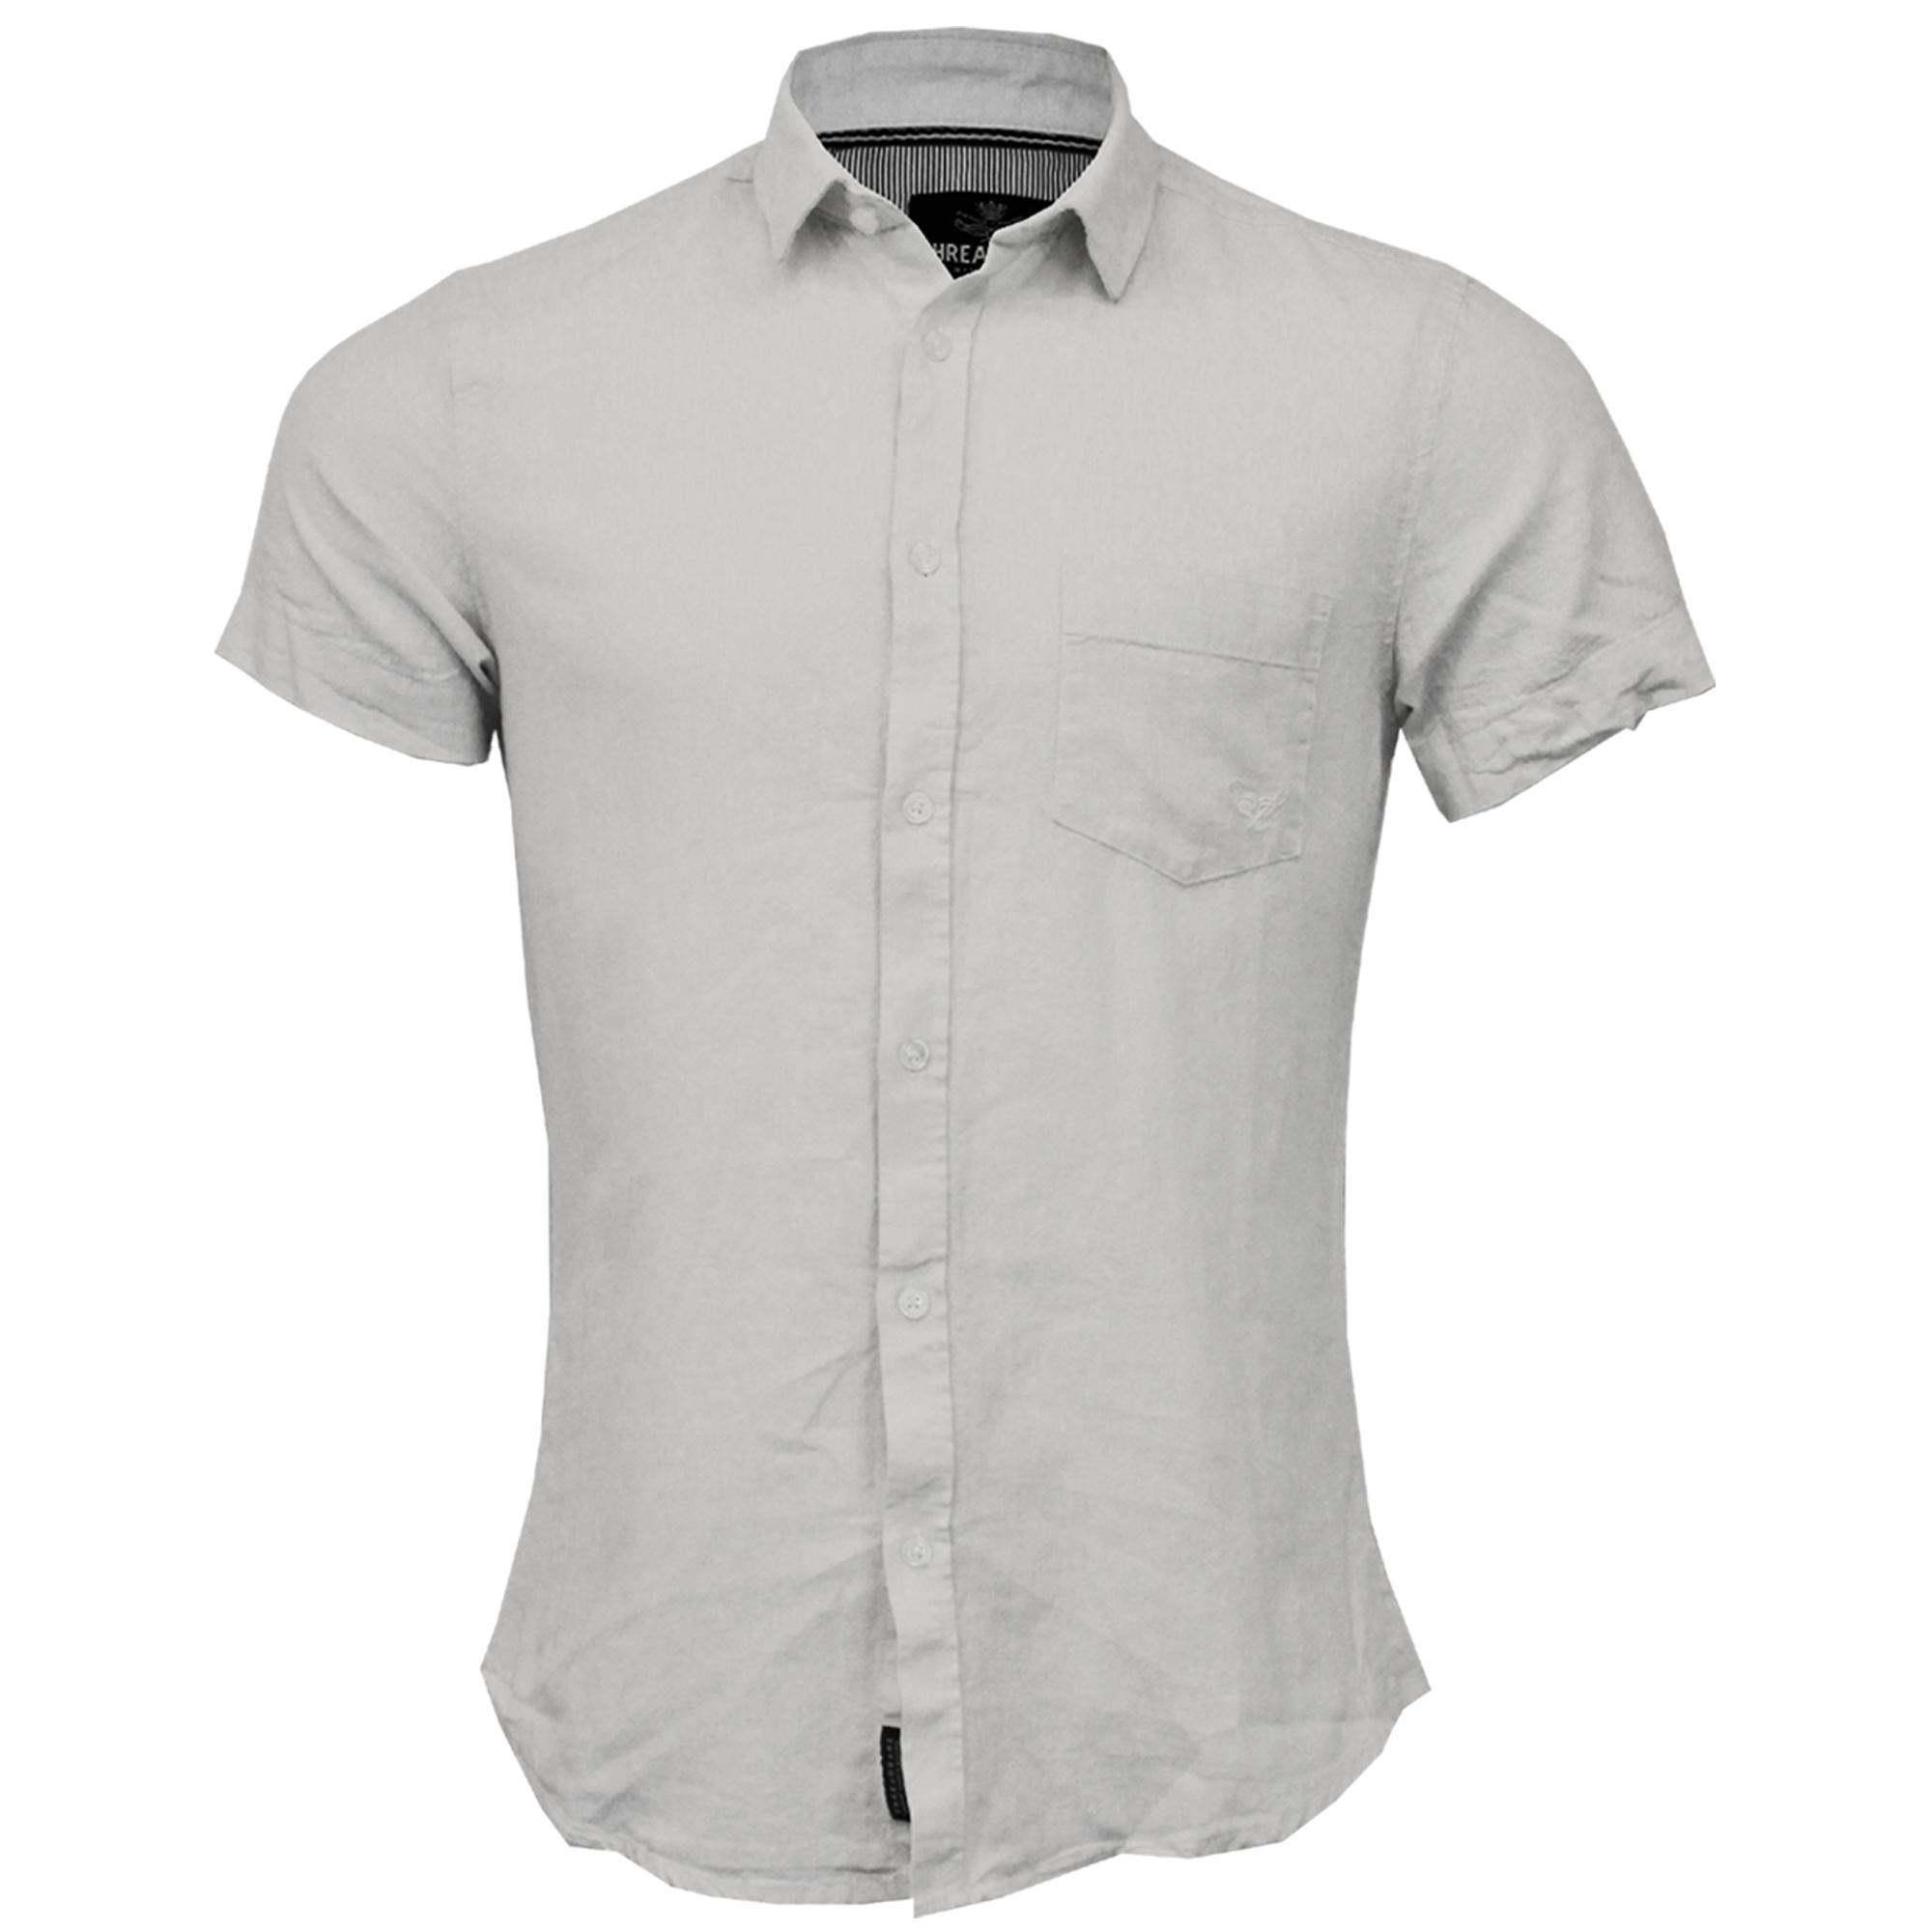 Mens-Linen-Shirt-Threadbare-Short-Sleeved-Brave-Soul-Collared-Casual-Summer-New thumbnail 25